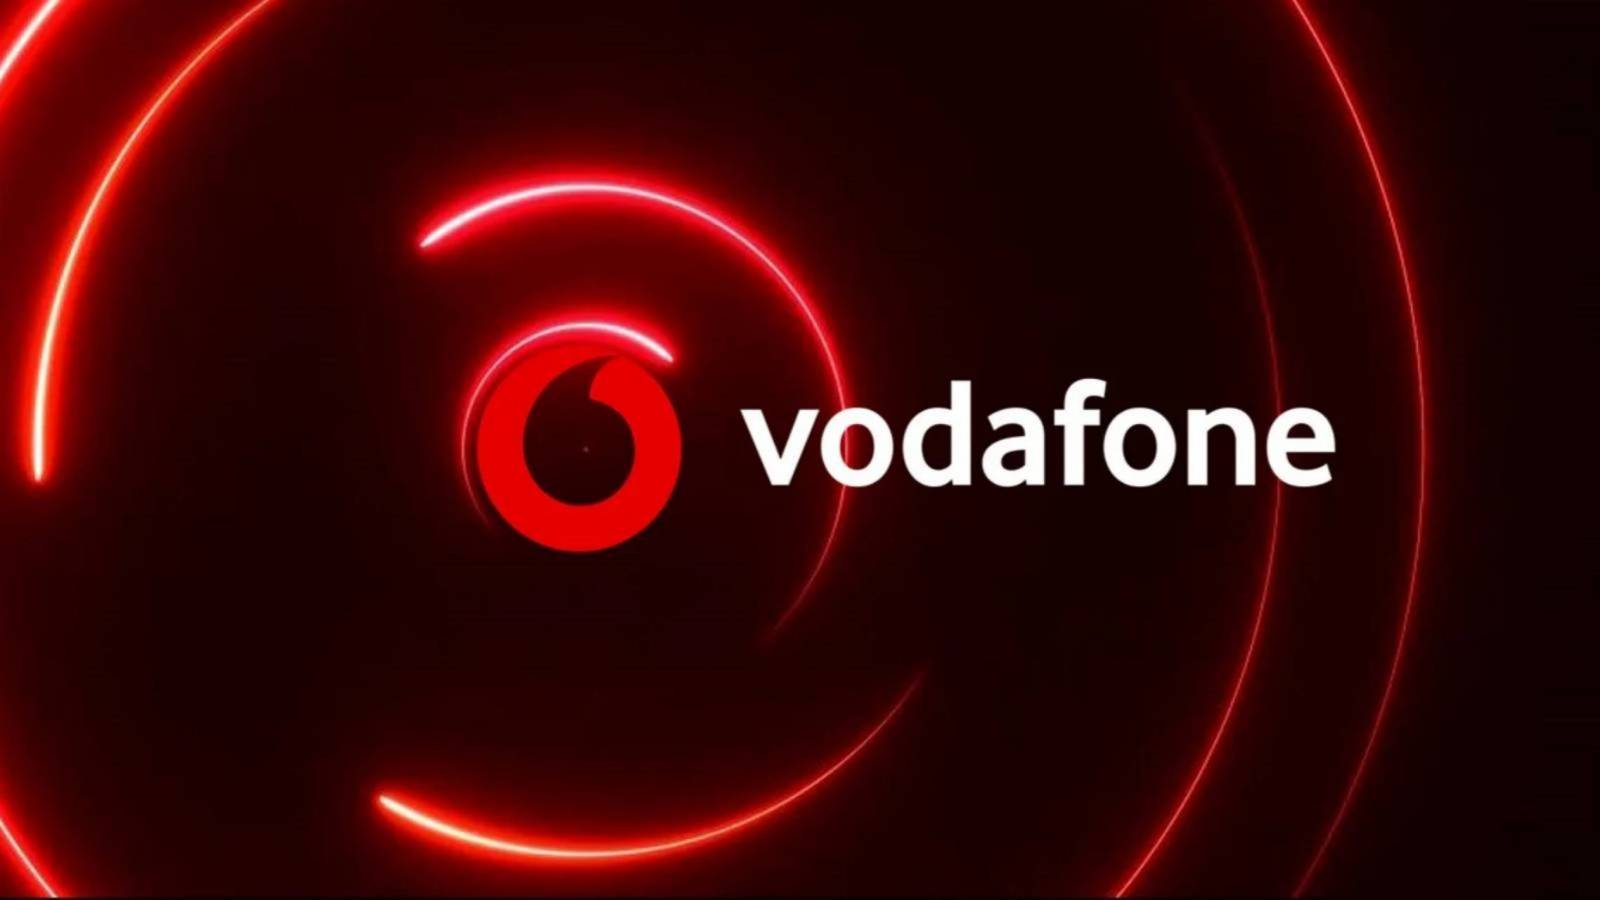 Vodafone actualizari